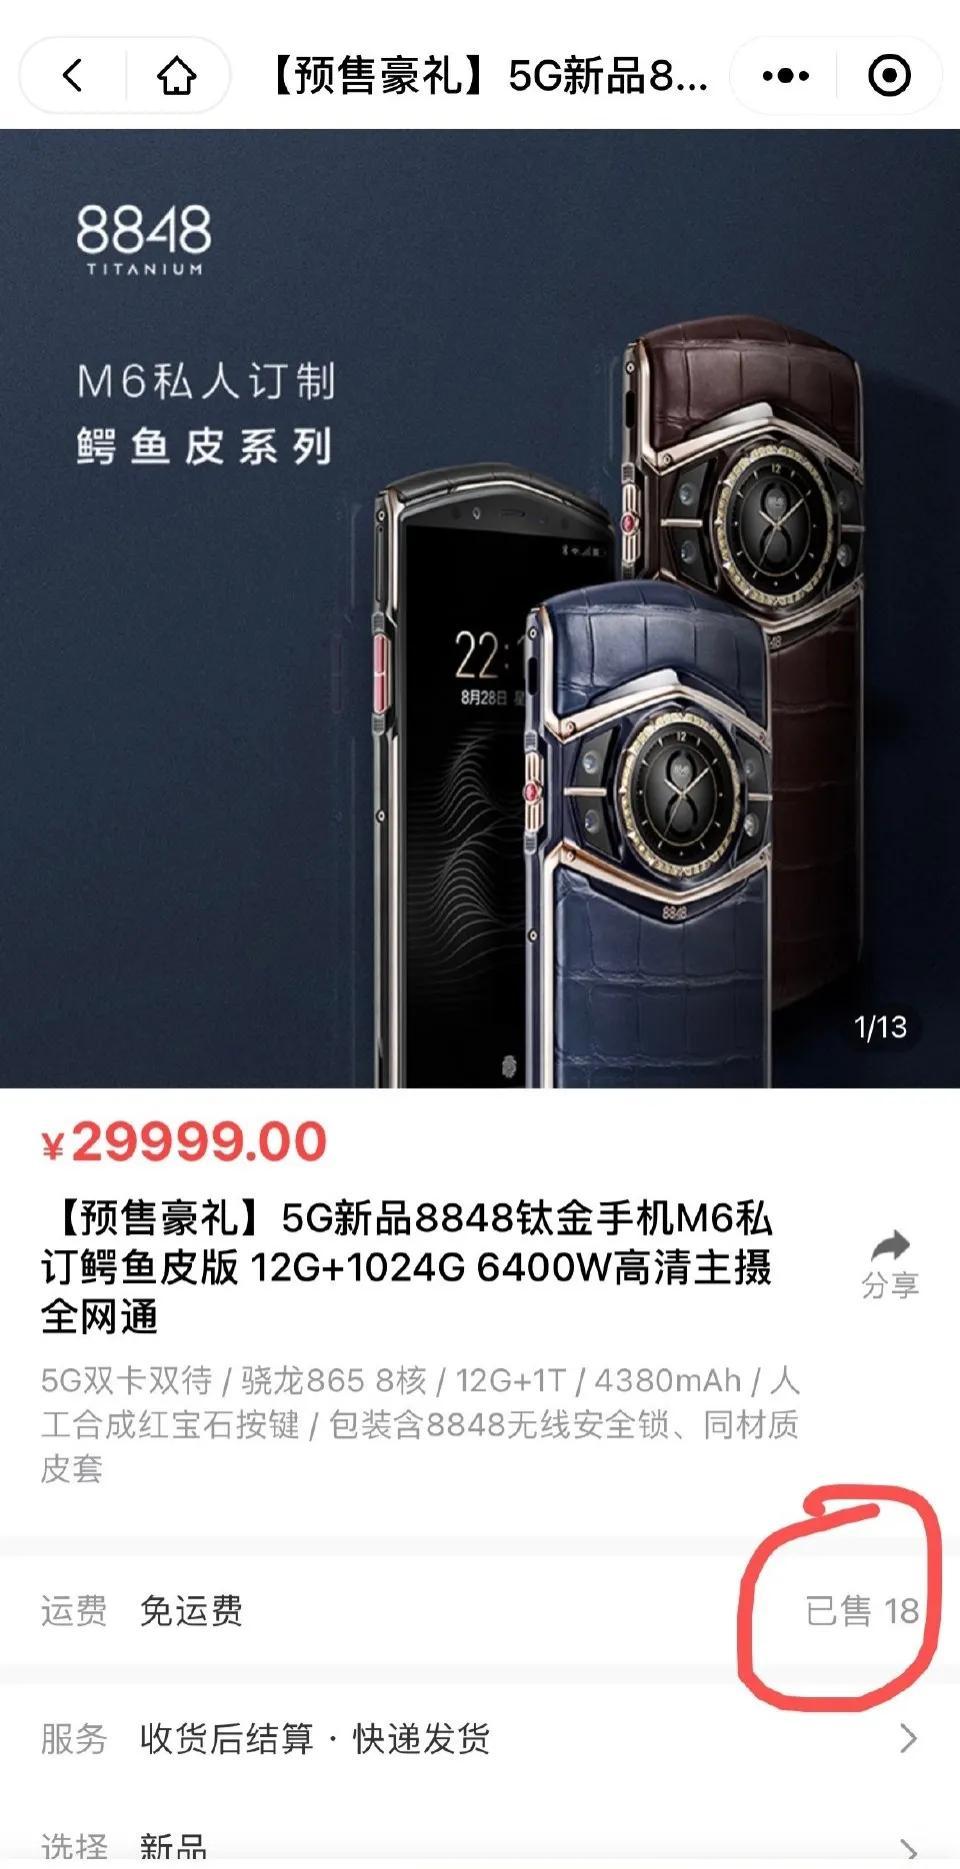 iPhone13Pro黄金版起售价27万(18K纯金)